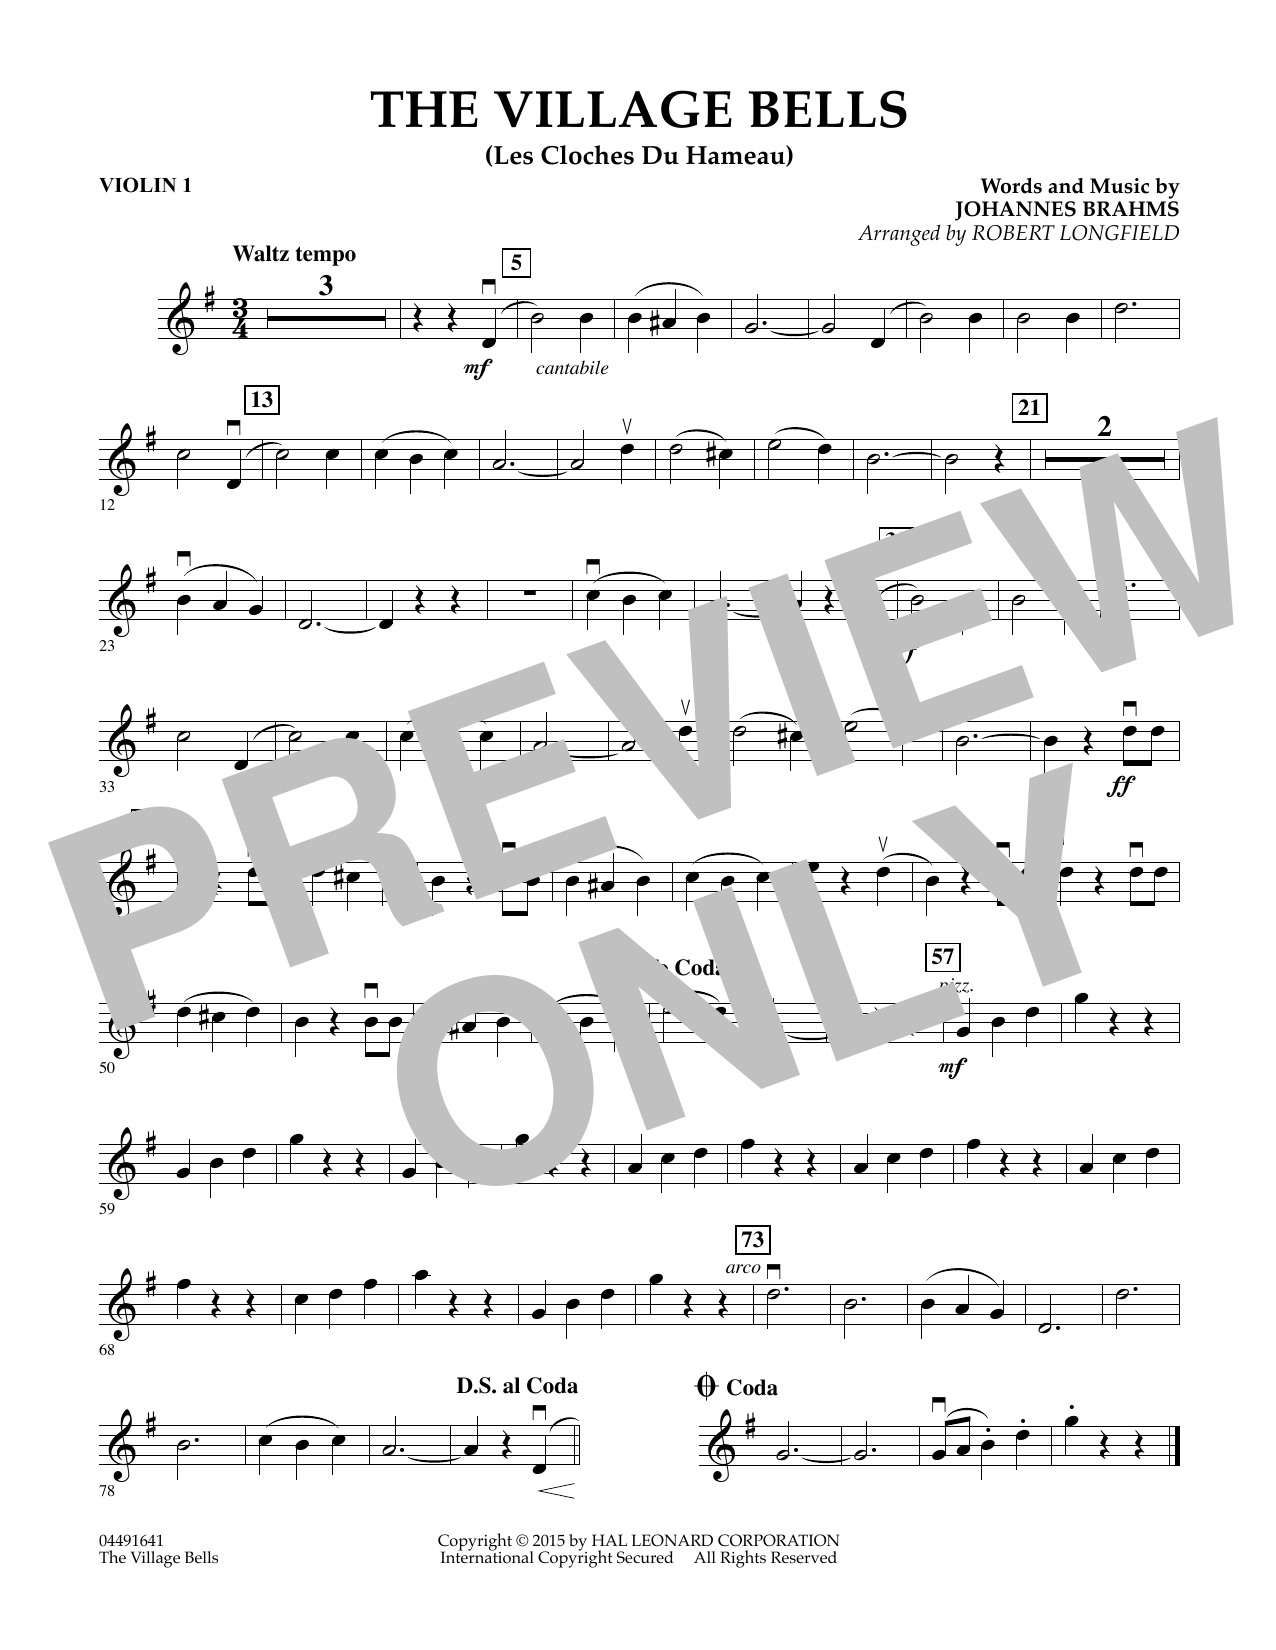 The Village Bells (Les Cloche du Hameau) - Violin 1 (Orchestra)